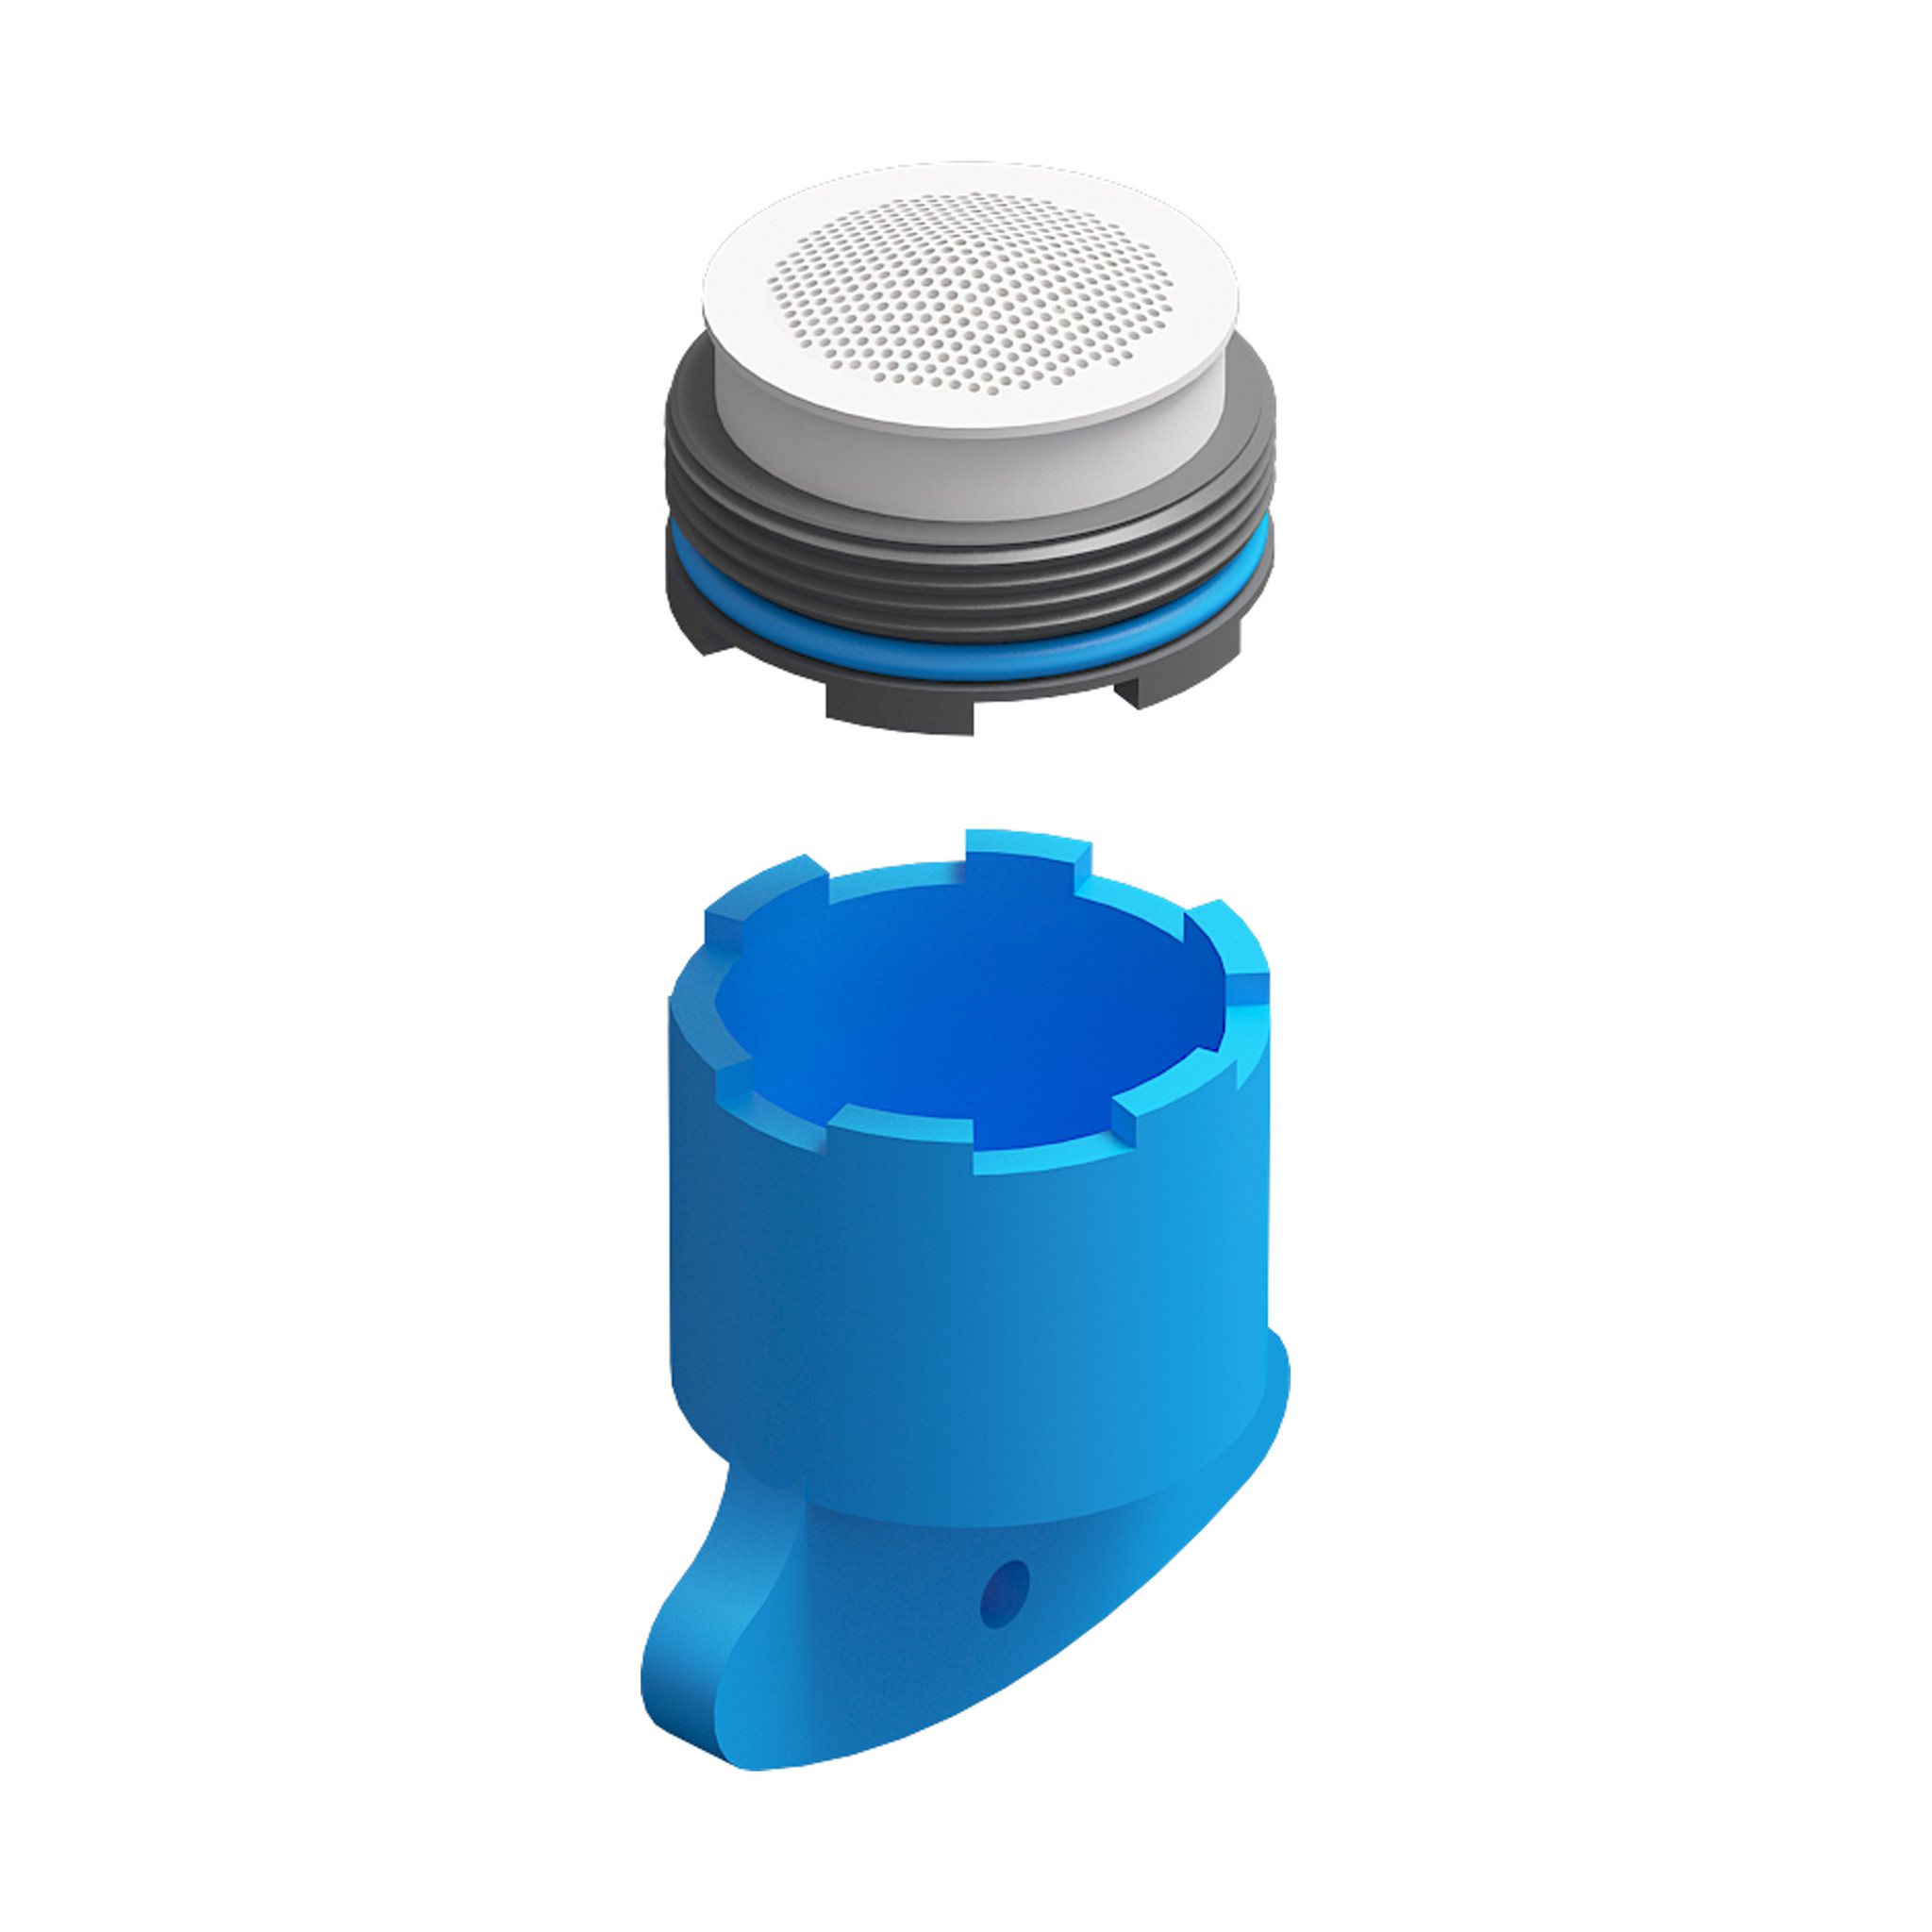 Xo Water breaker for Xo bathtub mixers type 7 & 8, with key